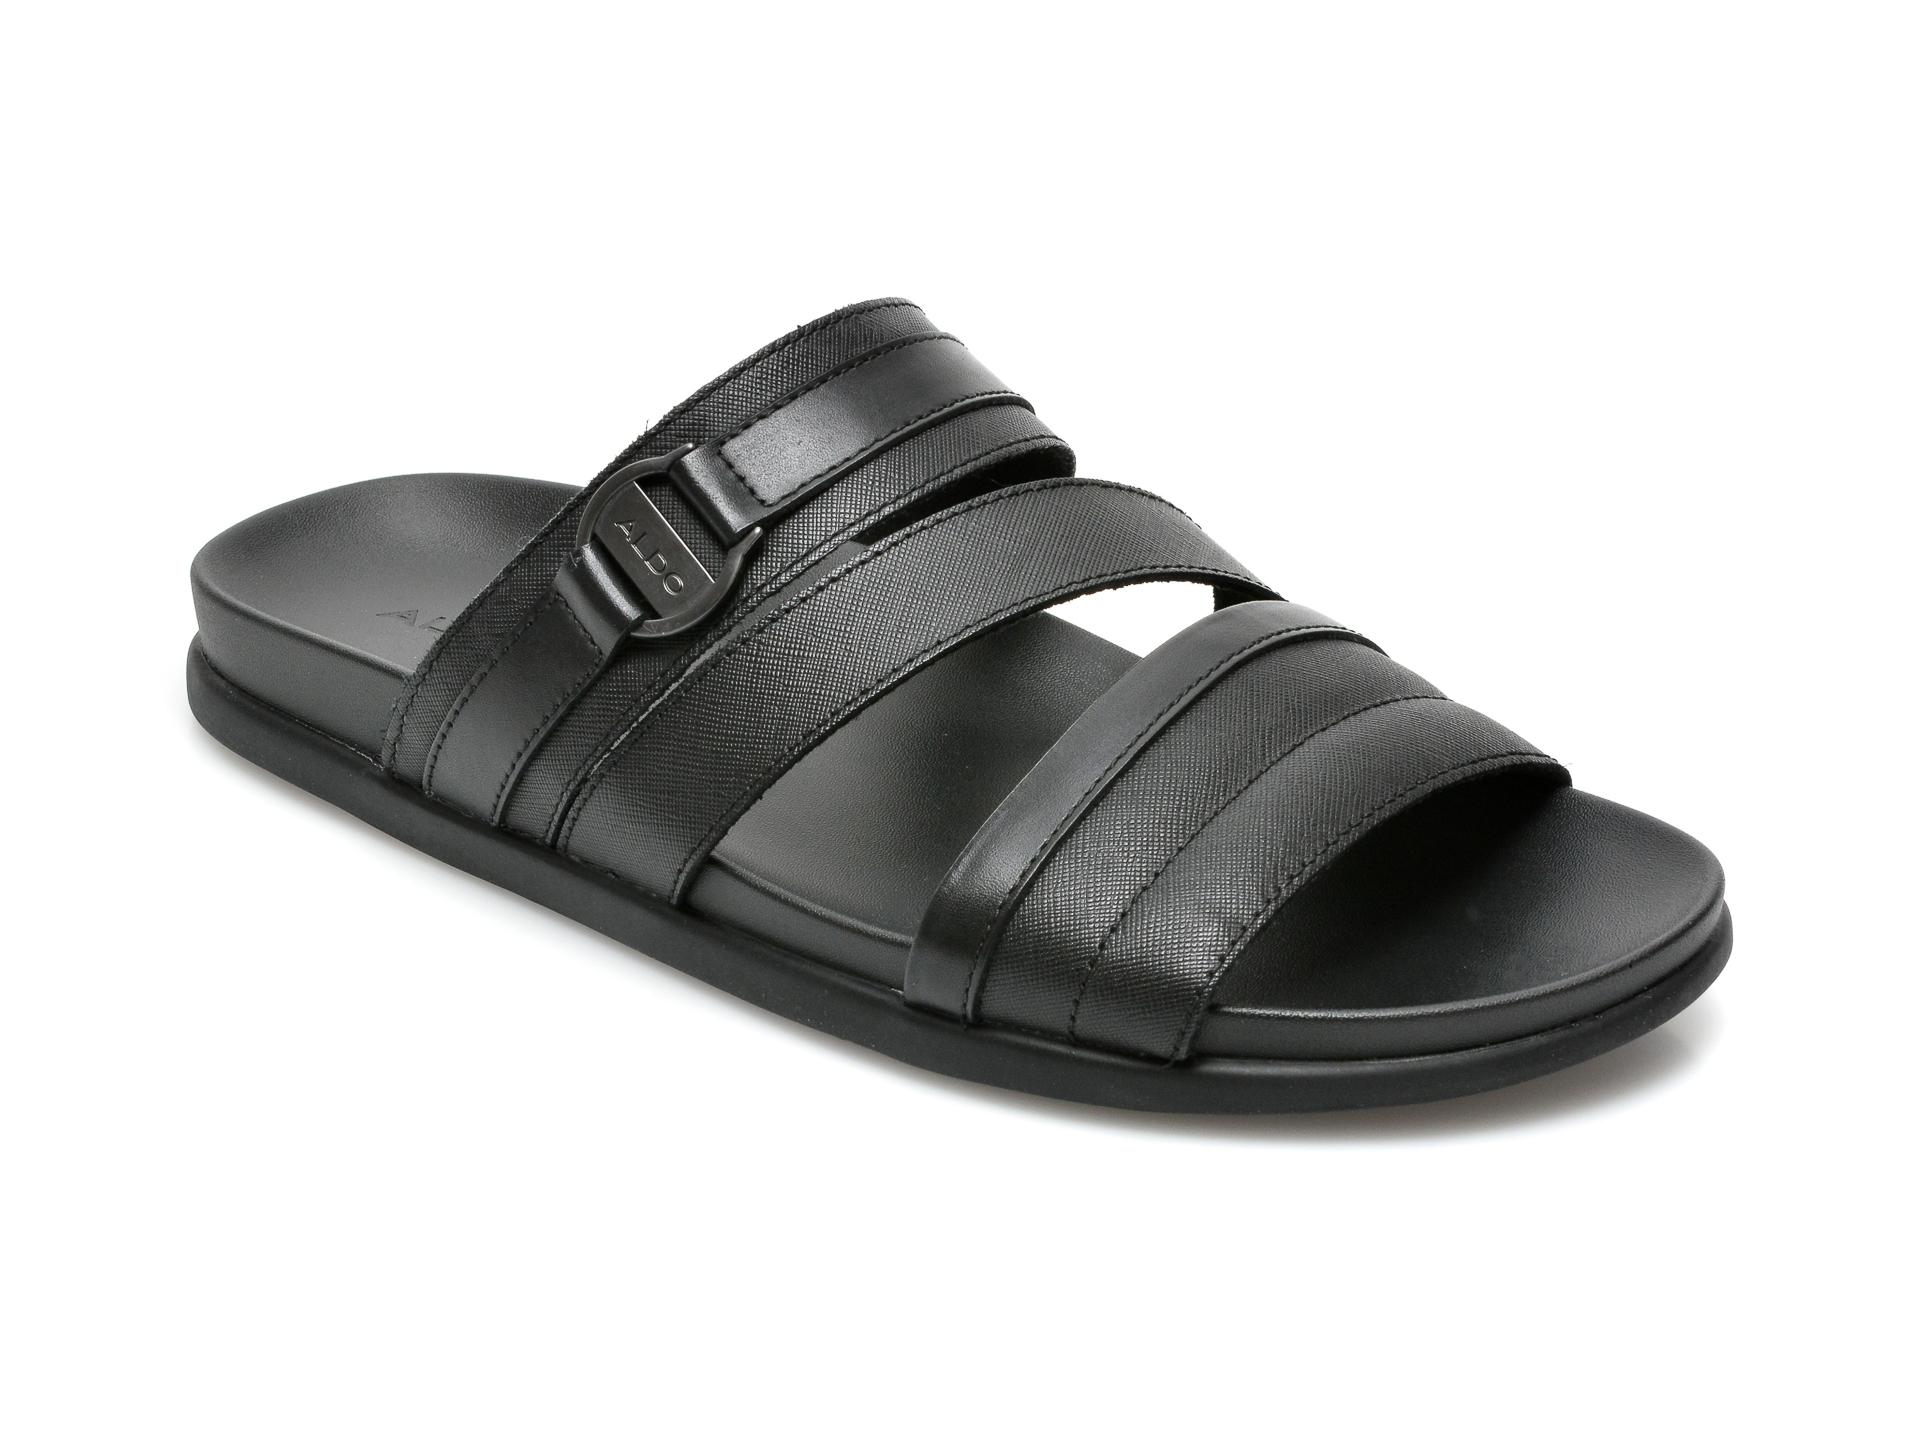 Papuci ALDO negri, Mirerasien001, din piele naturala